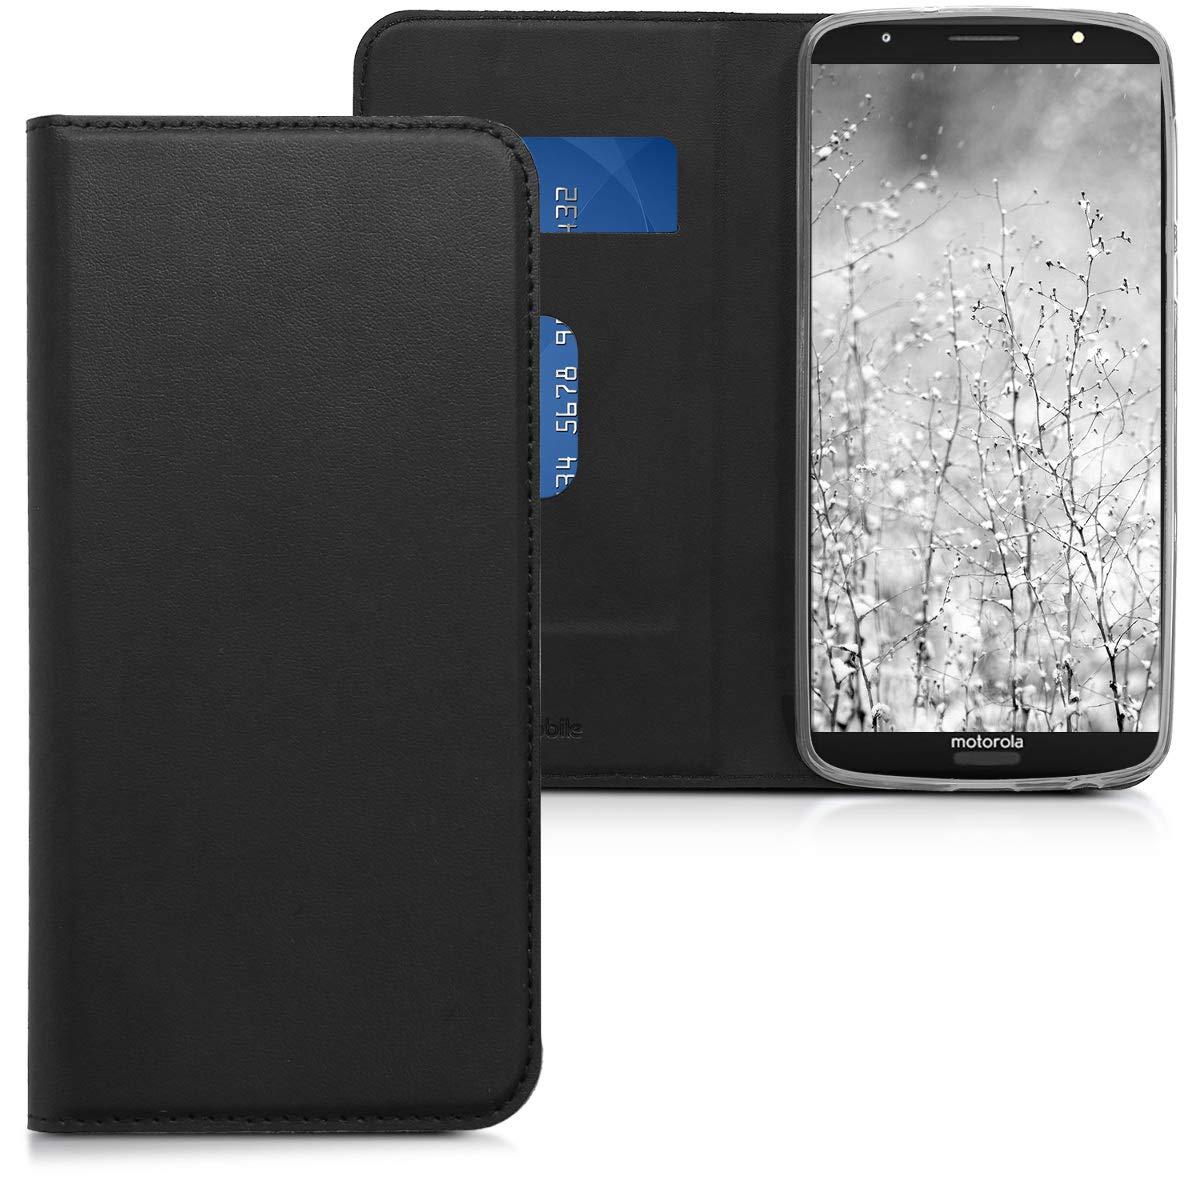 Cuero sint/ético Plegable en Negro Carcasa para m/óvil de - Case kwmobile Funda para Motorola Moto G6 Plus